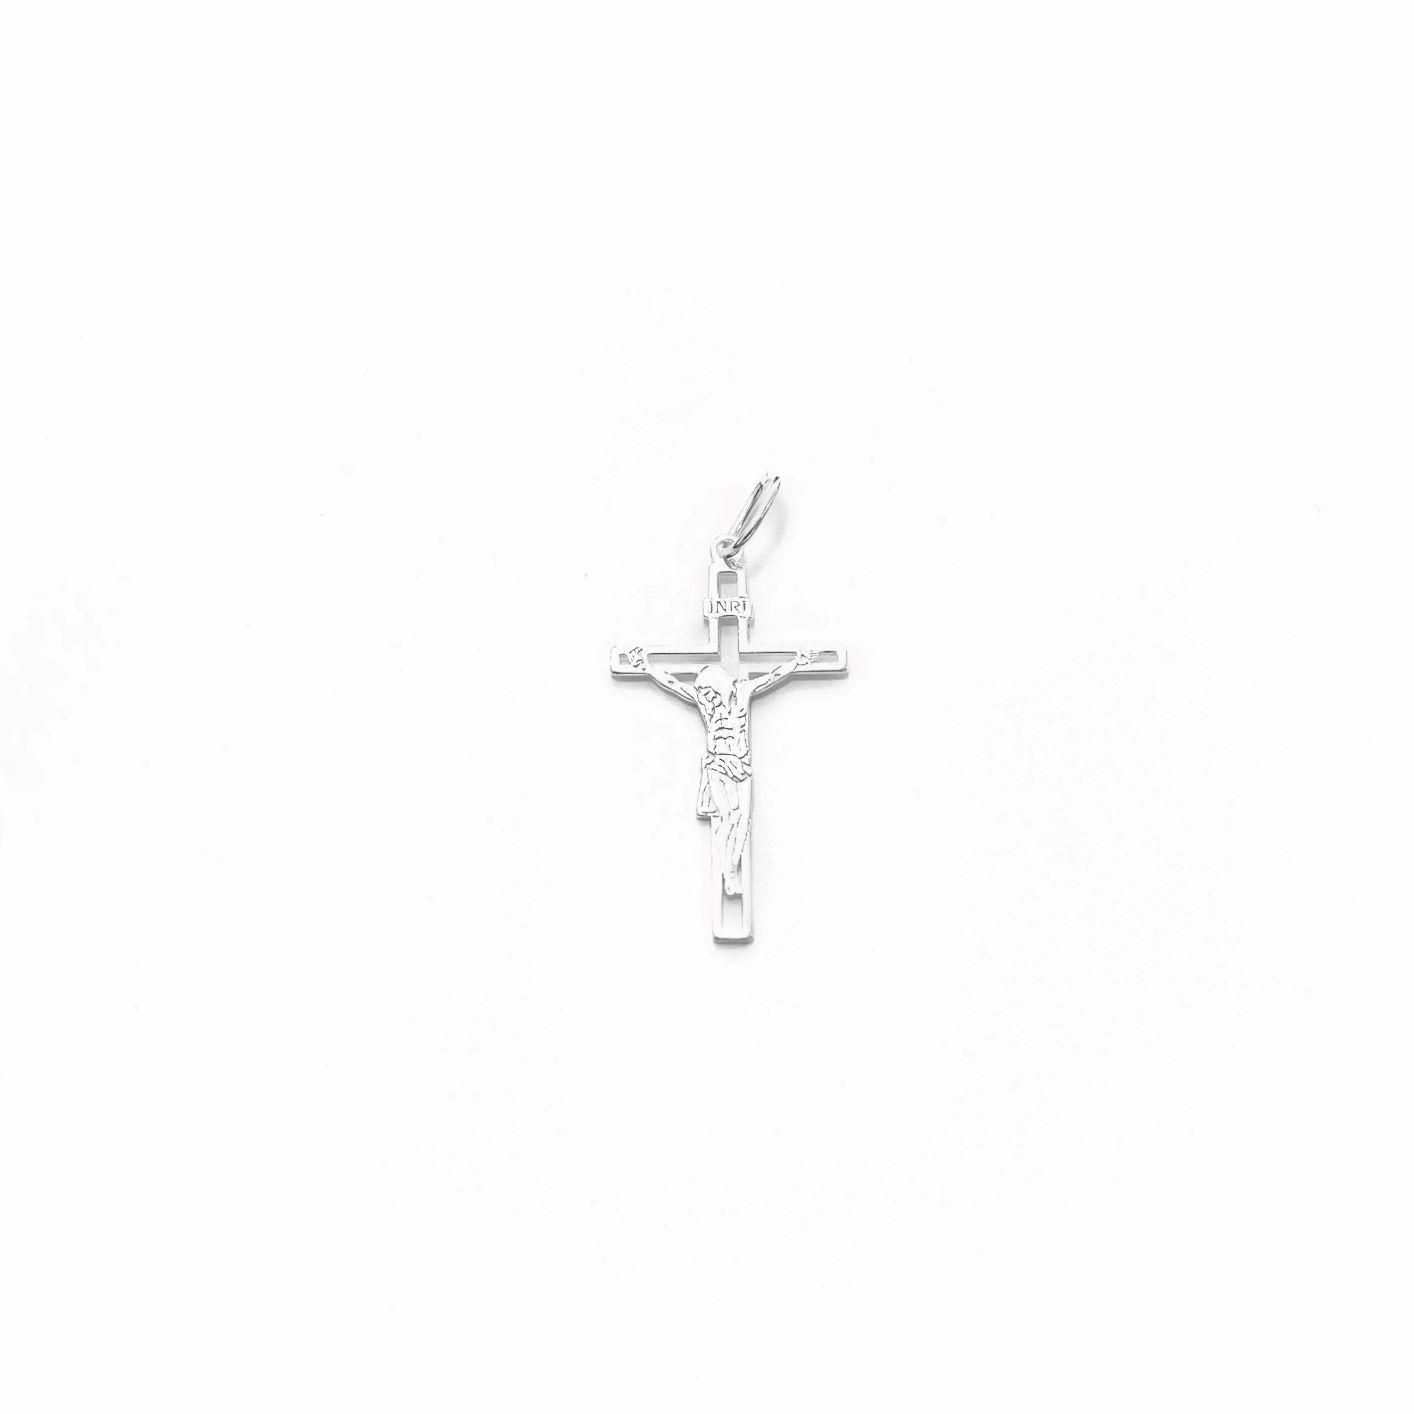 Pingente Crucifixo Jesus Vazado 2,7cm x 1,5cm (Prata 925 Italiana)